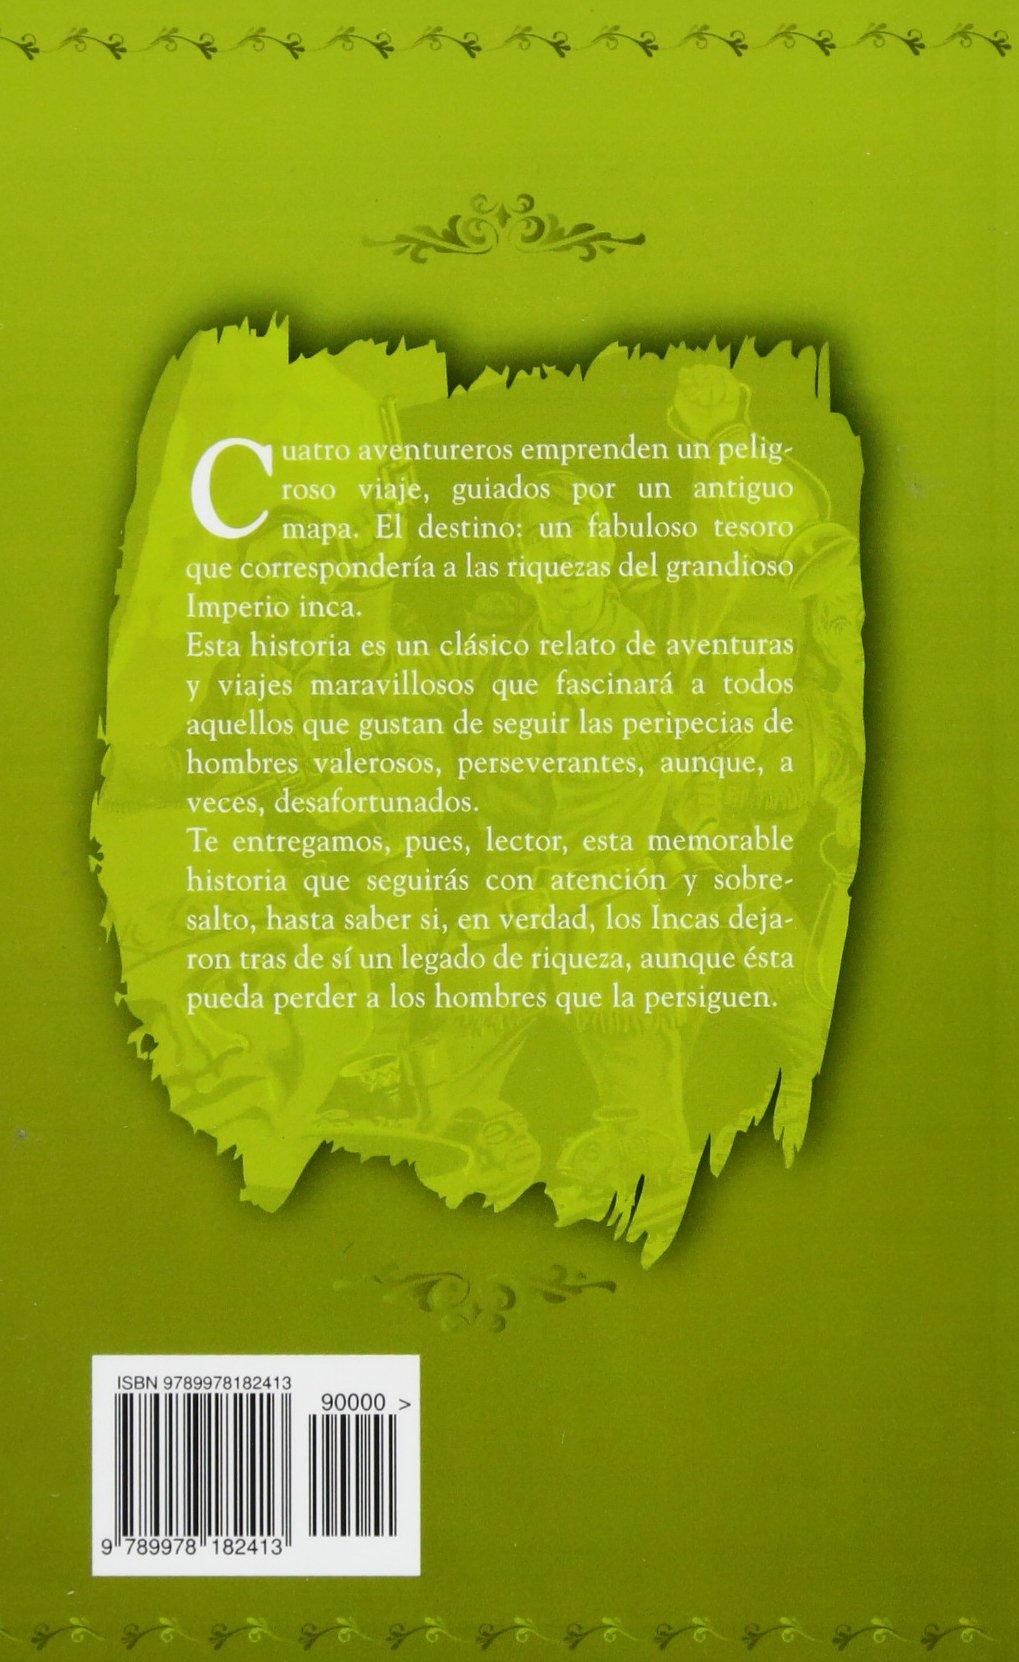 El Tesoro de los Incas (Ariel Juvenil Ilustrada) (Volume 26) (Spanish Edition): Rafael Díaz Ycaza, Emilio Salgari, Nelson Jácome: 9789978182413: Amazon.com: ...